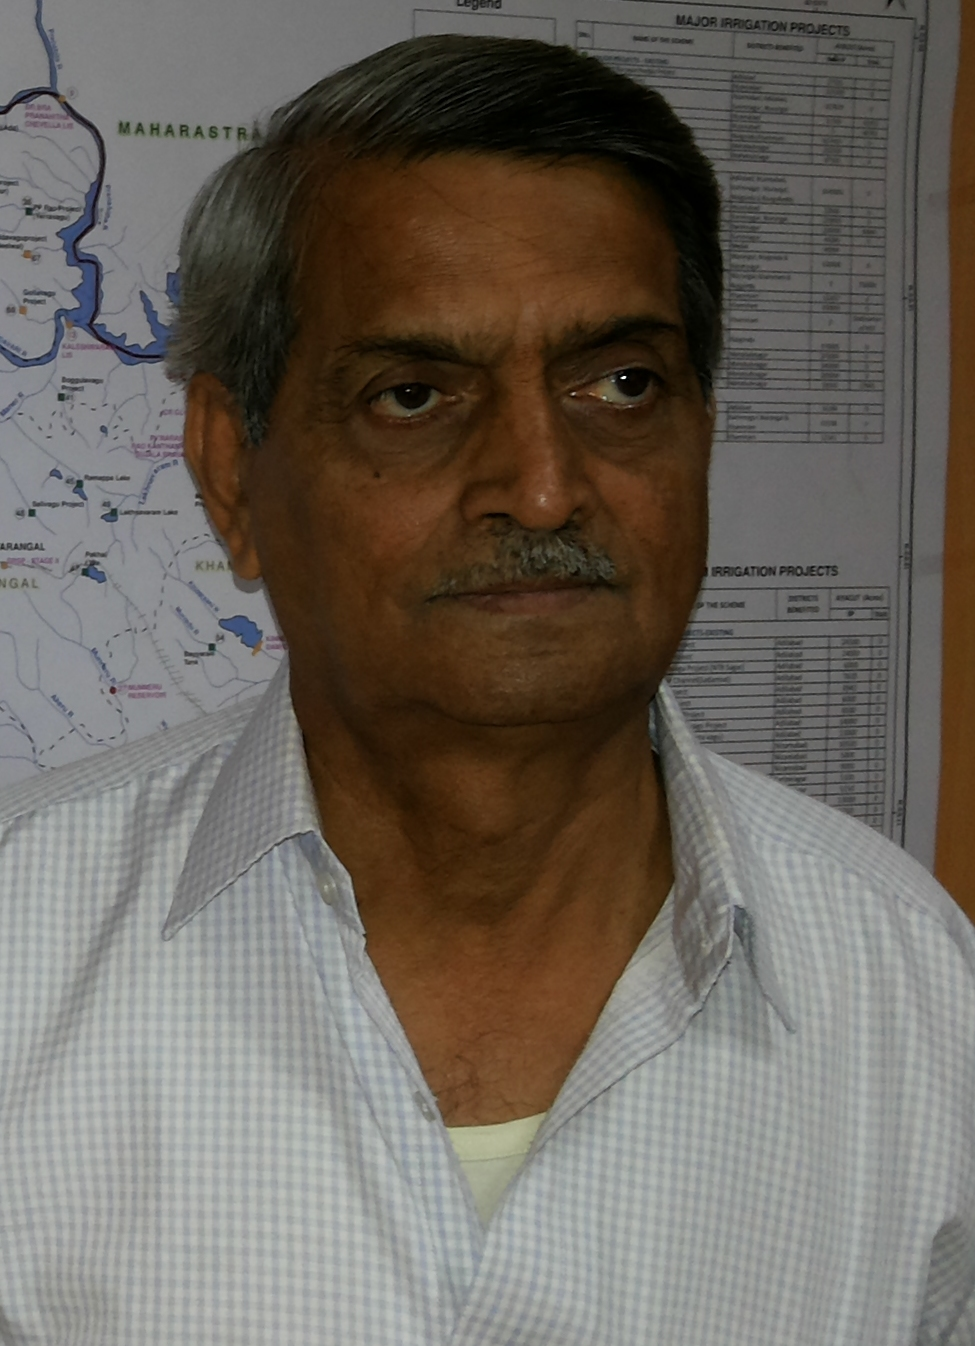 R Vidyasagar Rao Legendary Engineer From Telangana India In His Chambers July